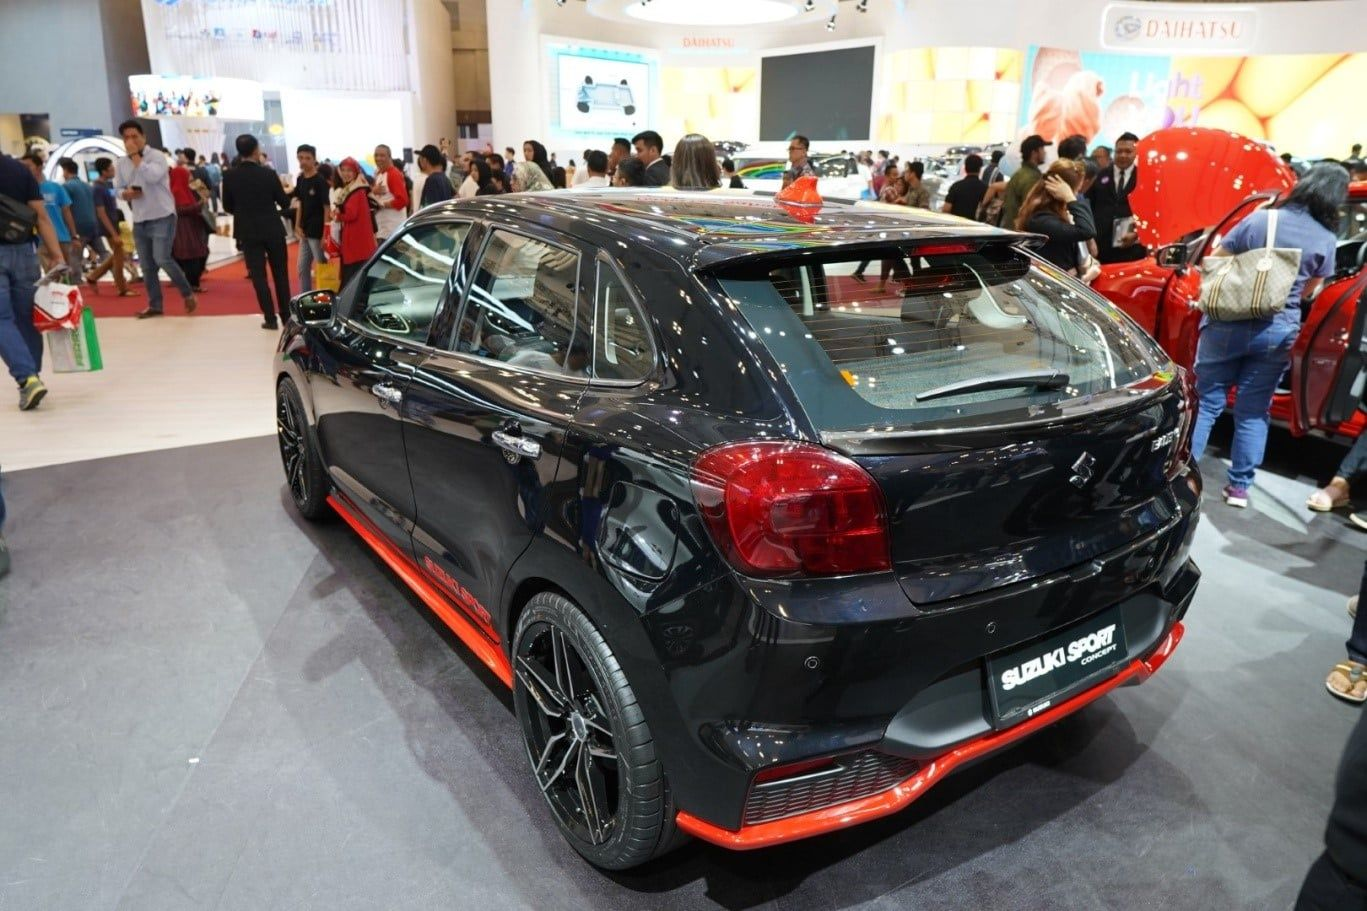 Modifikasi Mobil Suzuki Quality di 2020 Modifikasi mobil